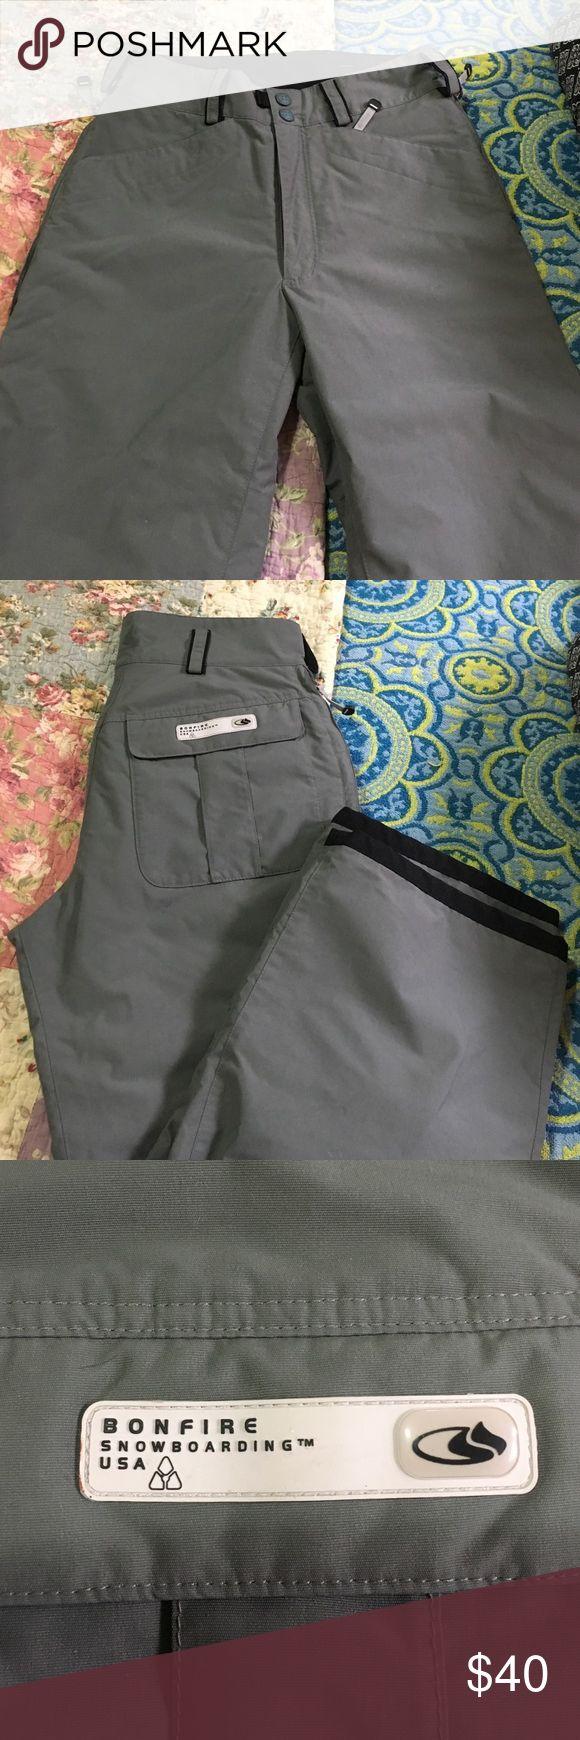 Bonfire Snowboarding pants. Size Medium. Bonfire snowboarding pants. Great condition. Size Medium. Grey and black. Good quality. Pants